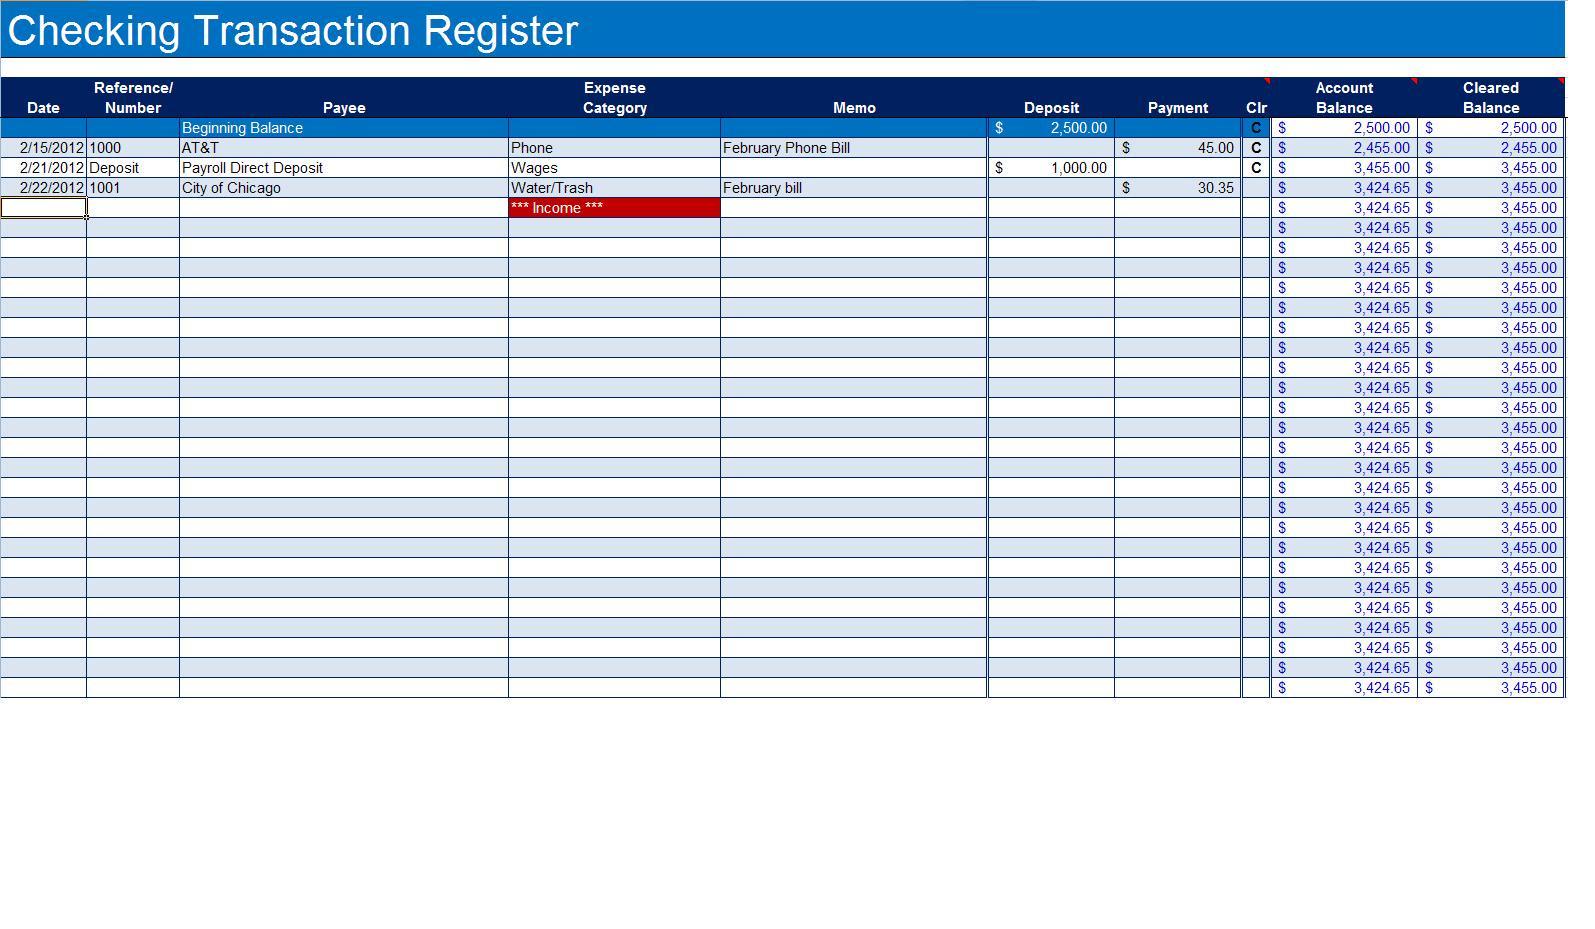 Checkbook Register Spreadsheet Excel Within How To Create A Checkbook Register In Excel  Turbofuture